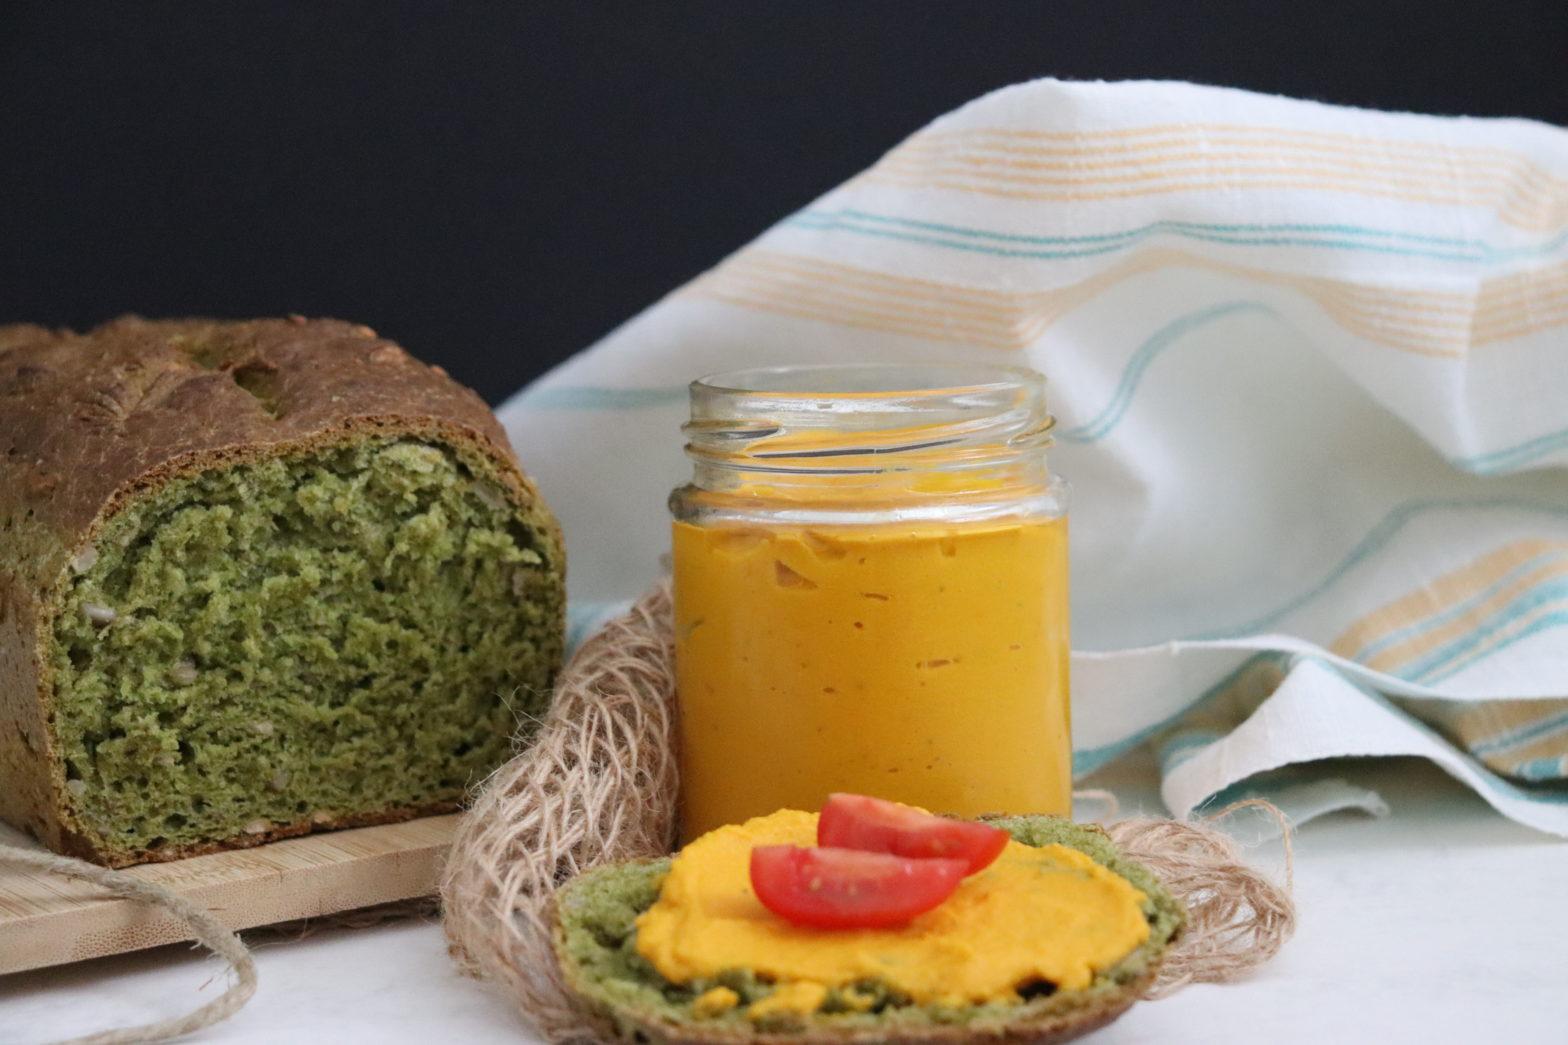 Spinatbrot mit veganer Karottenpaste